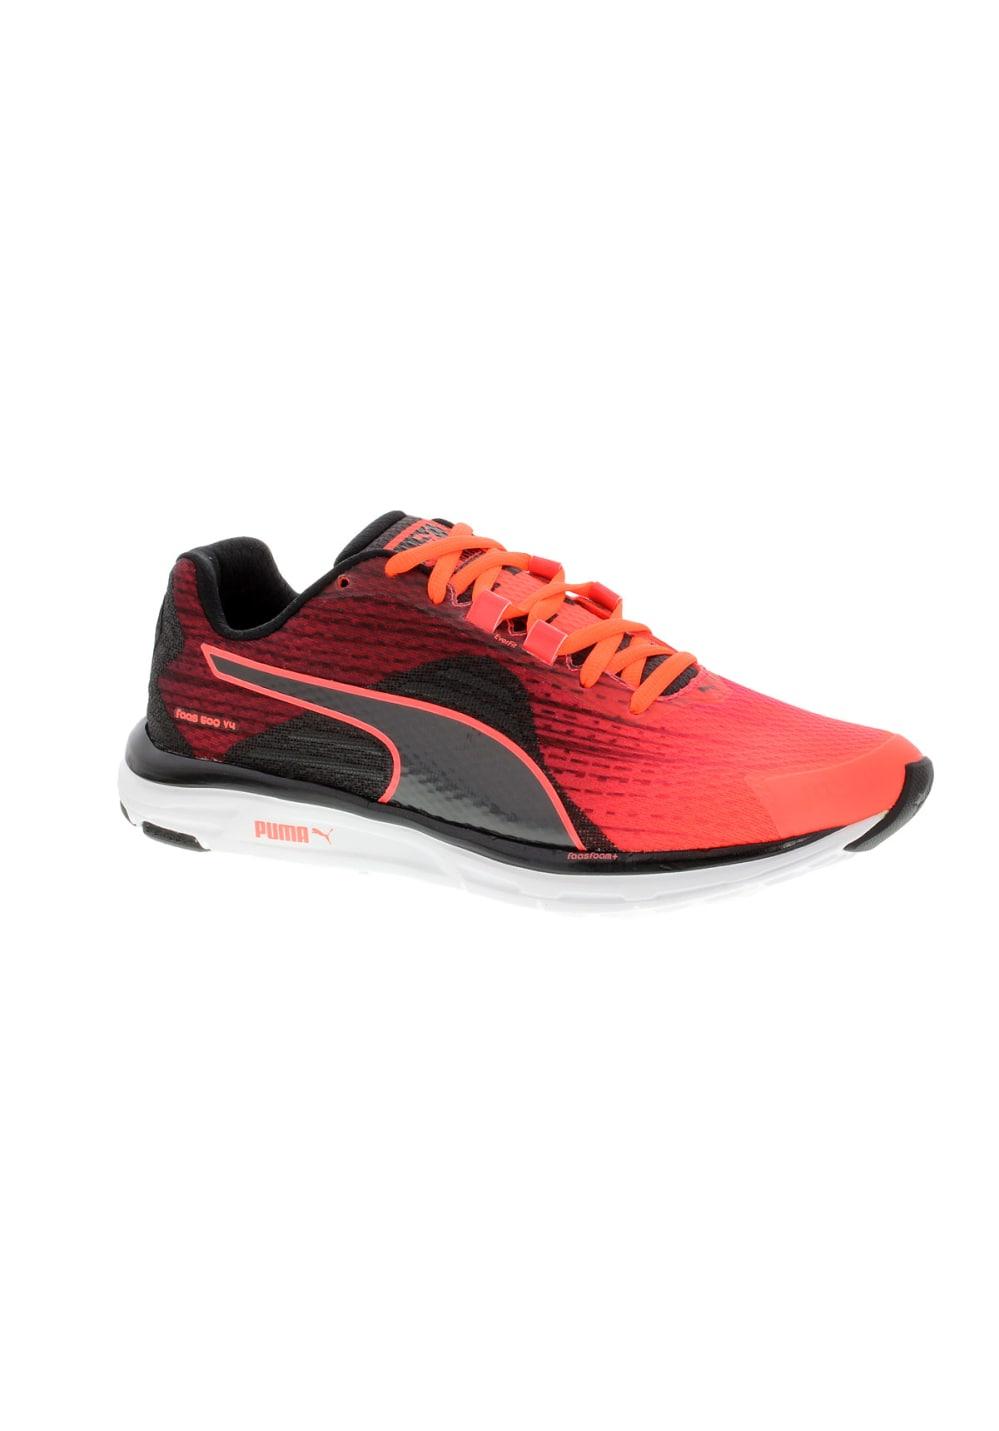 Puma Faas 500 v4 Chaussures running pour Femme Orange